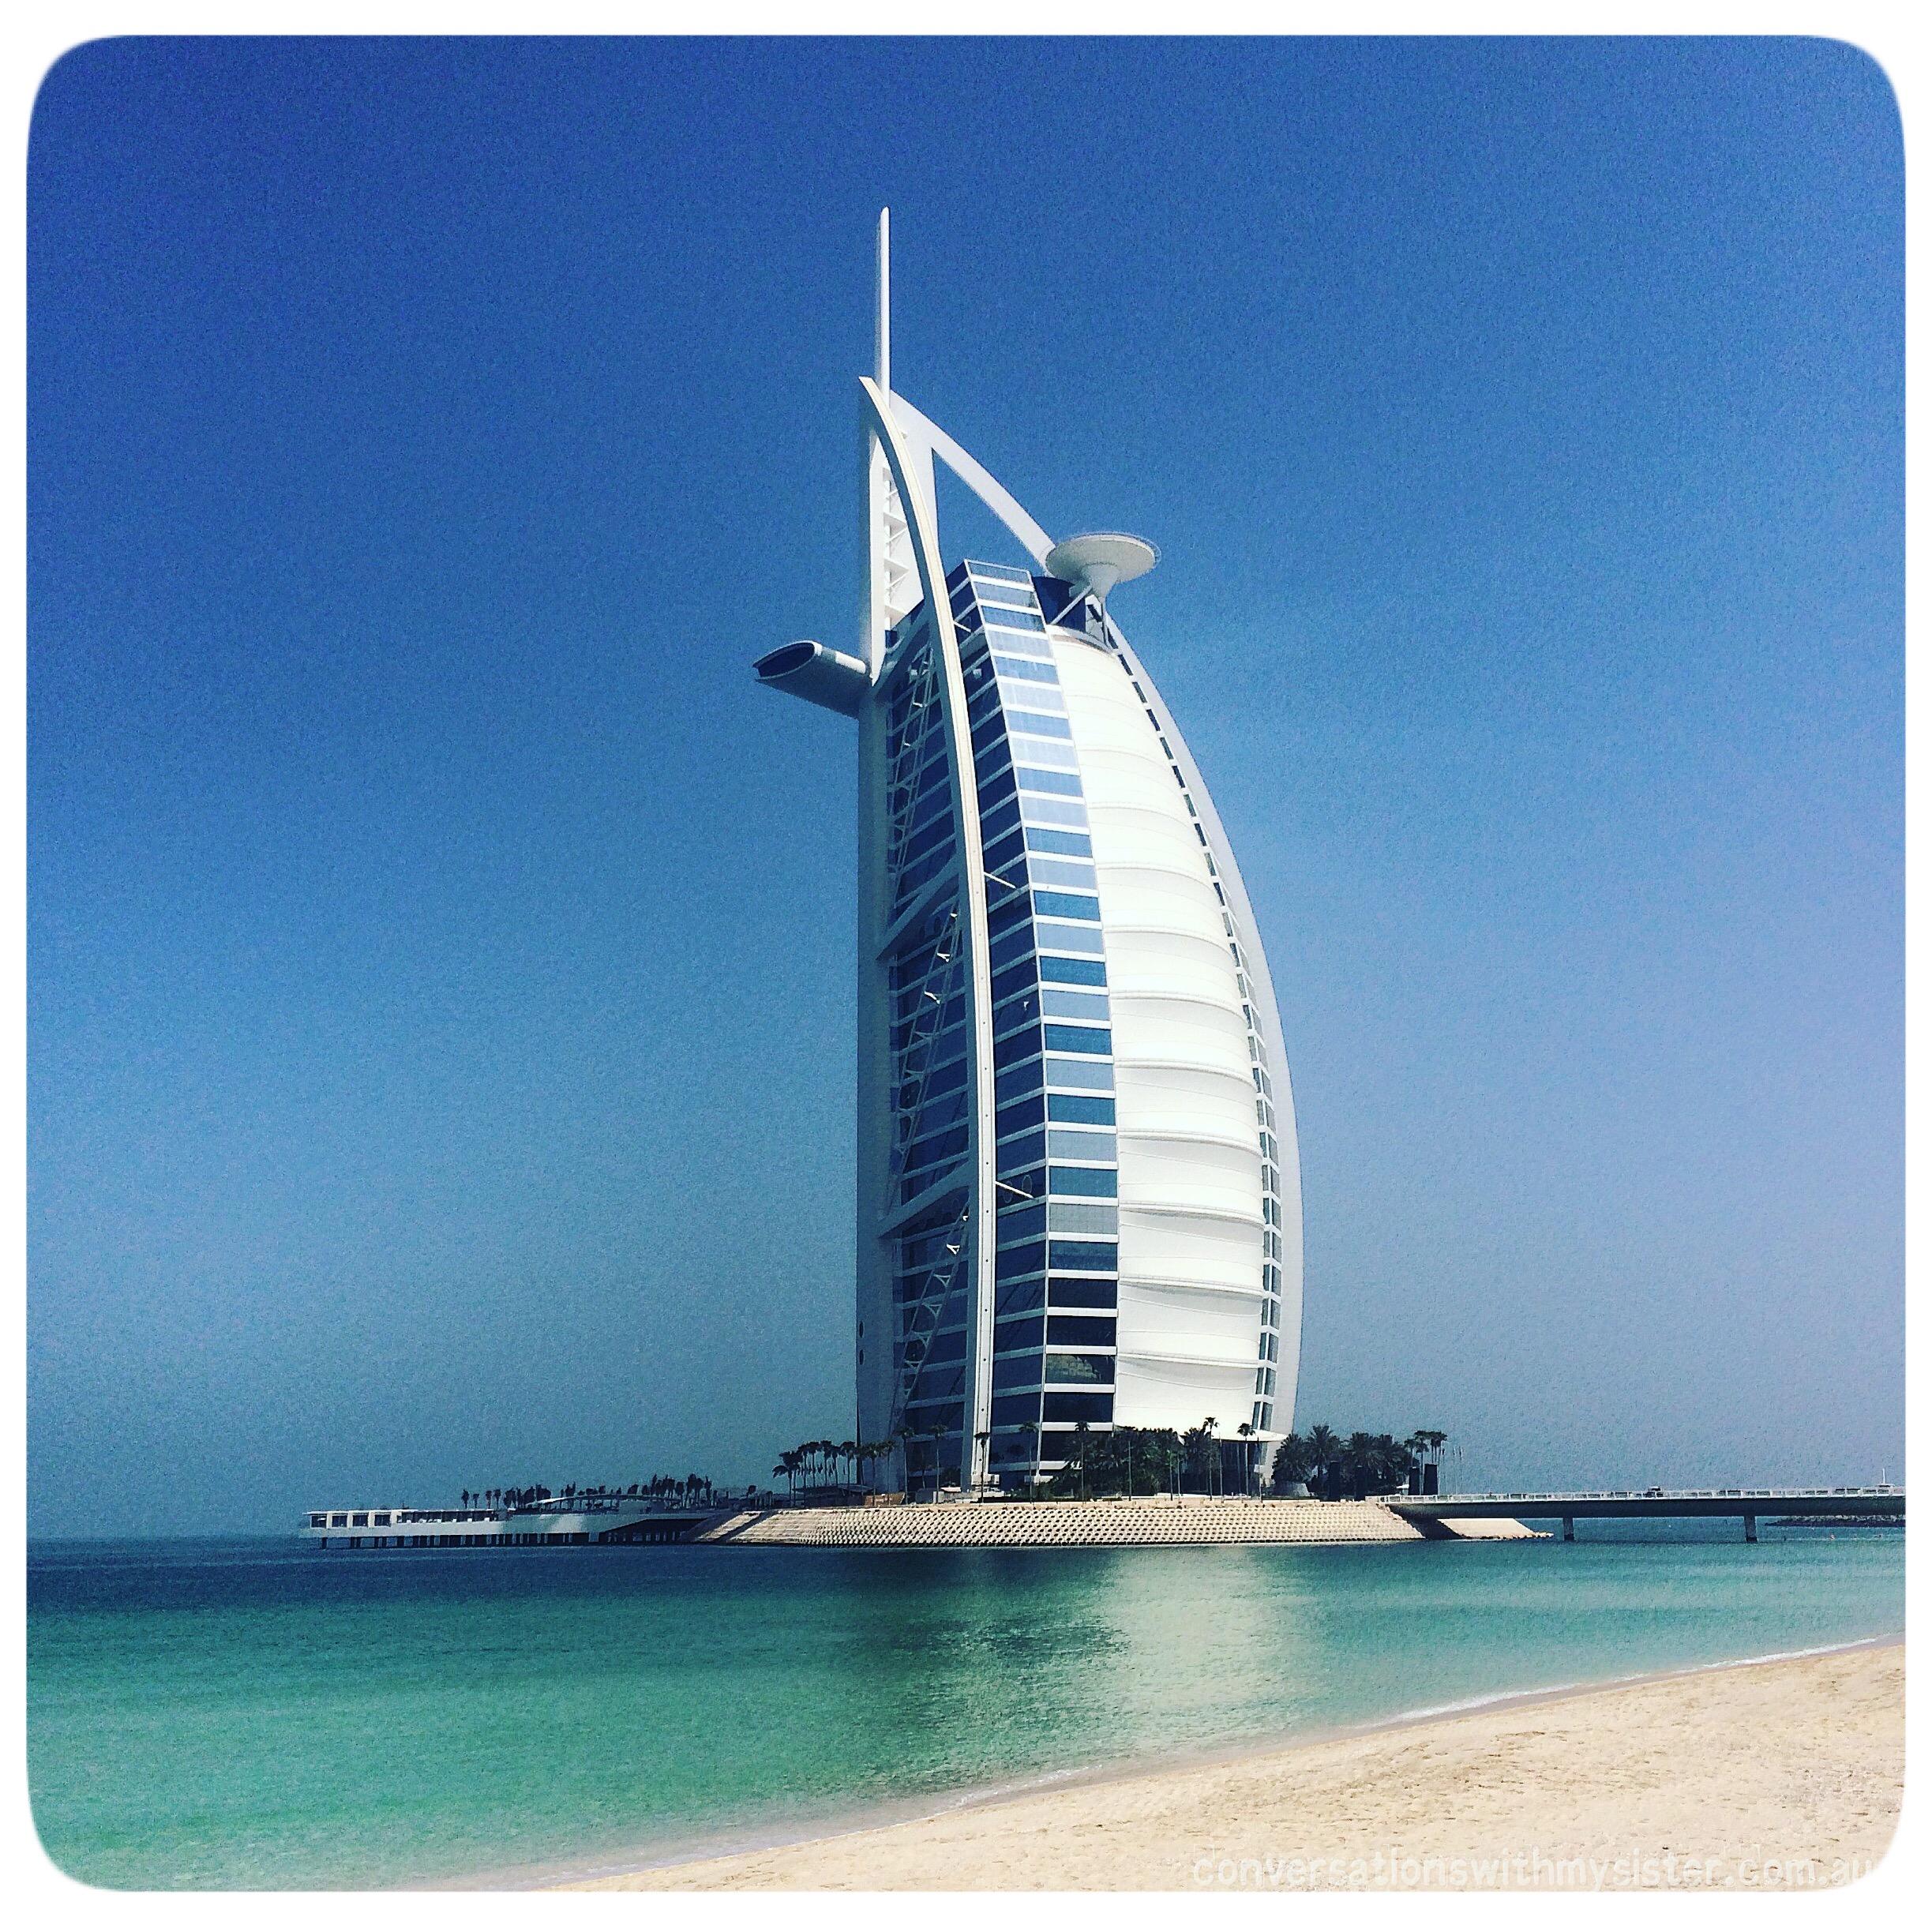 conversationswithmysister_madinat jumeirah_Burj Al Arab